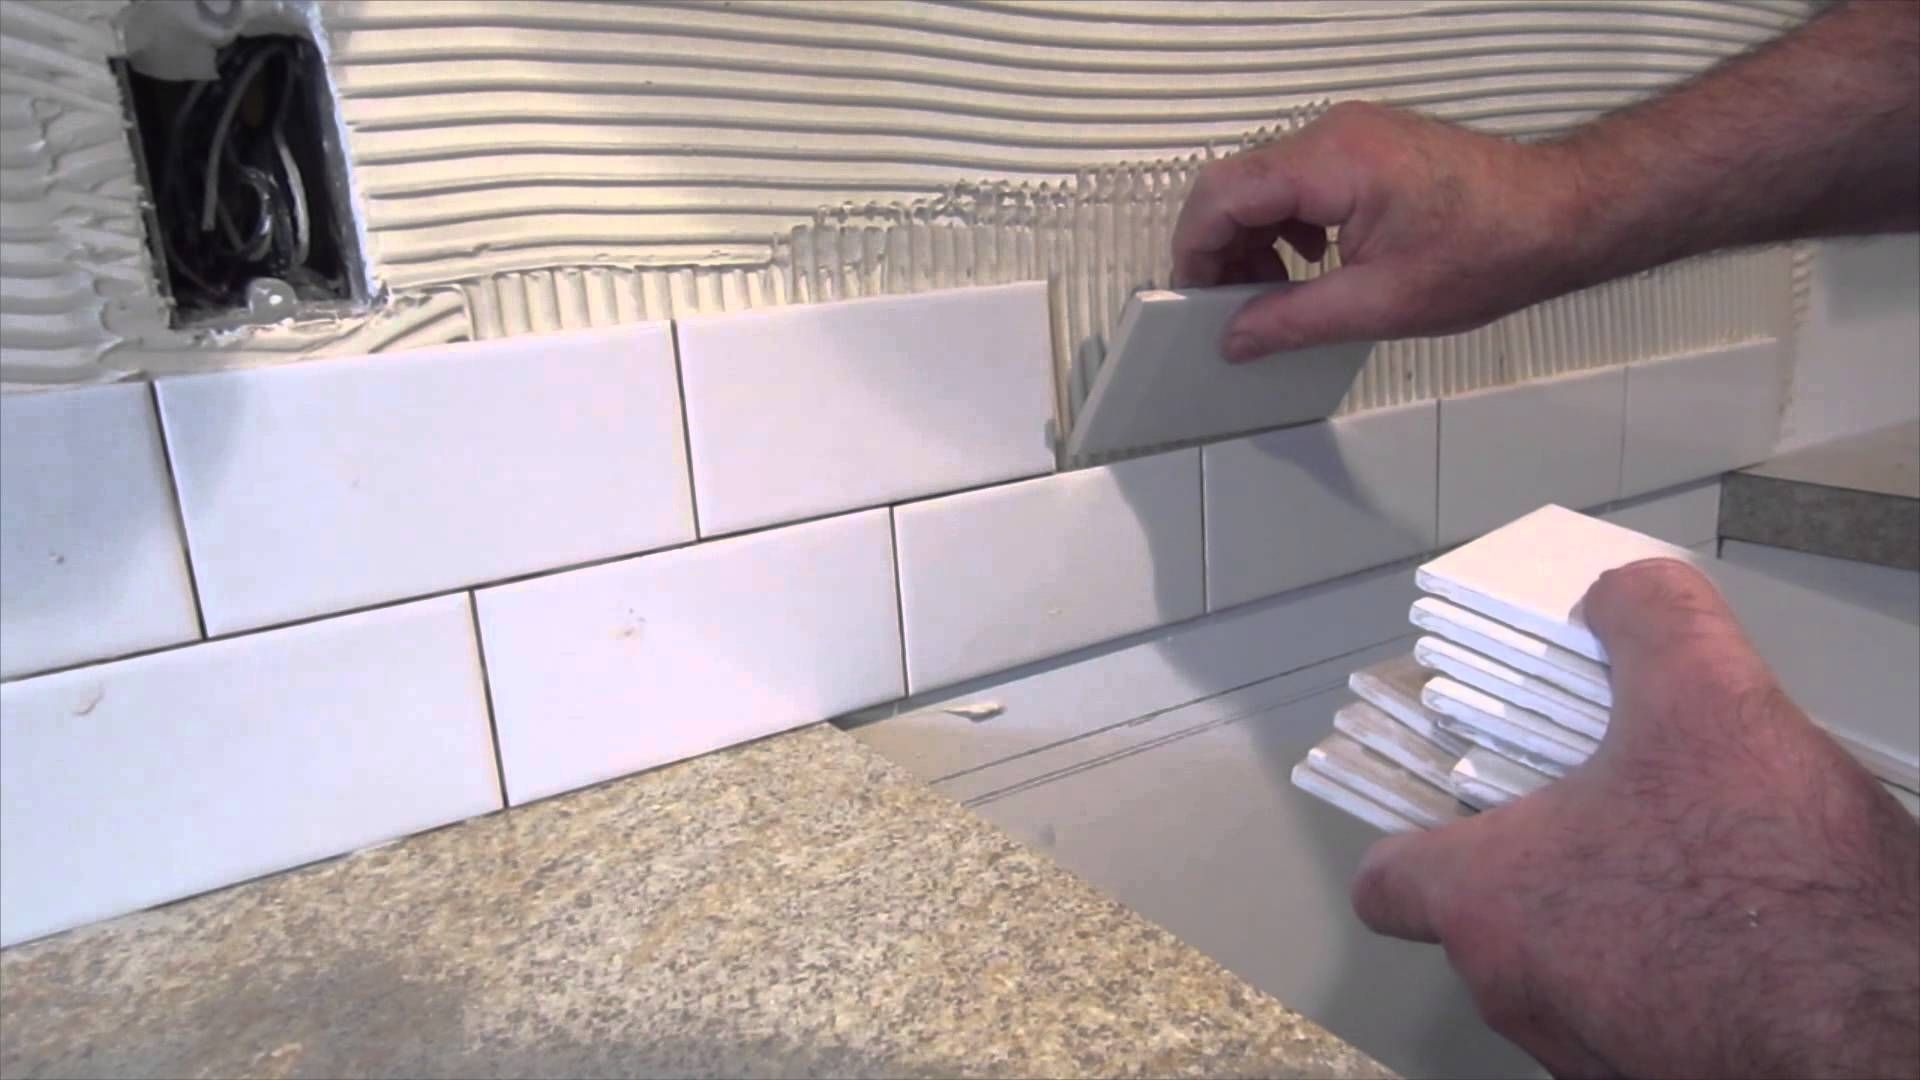 How To Install A Simple Subway Tile Kitchen Backsplash Diy Backsplash Subway Tile Kitchen Kitchen Tiles Backsplash